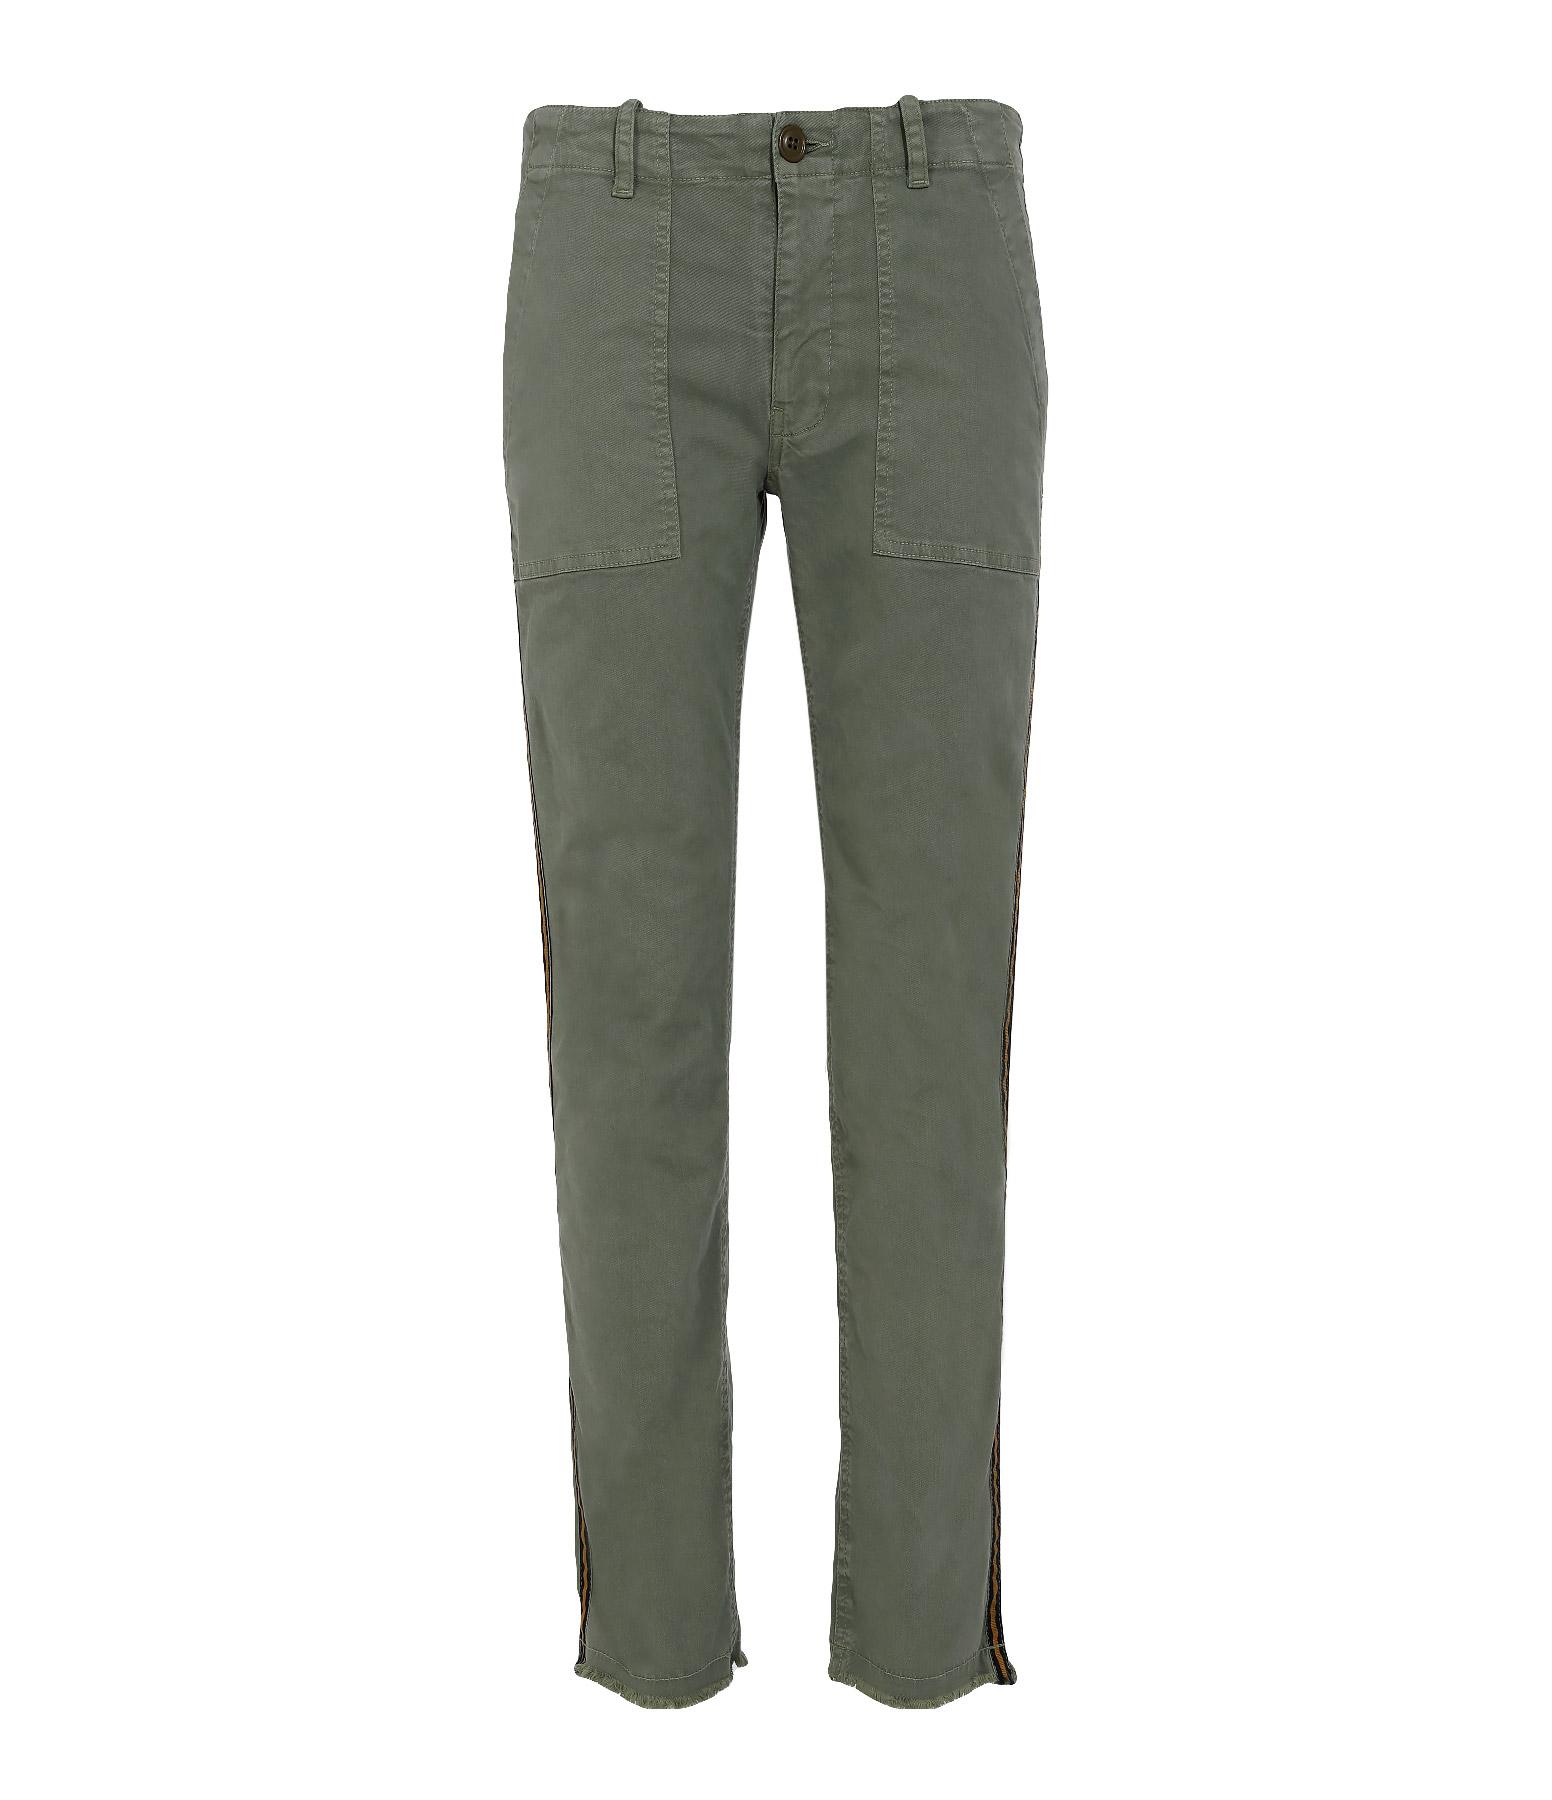 Pantalon Jenna Coton Camouflage